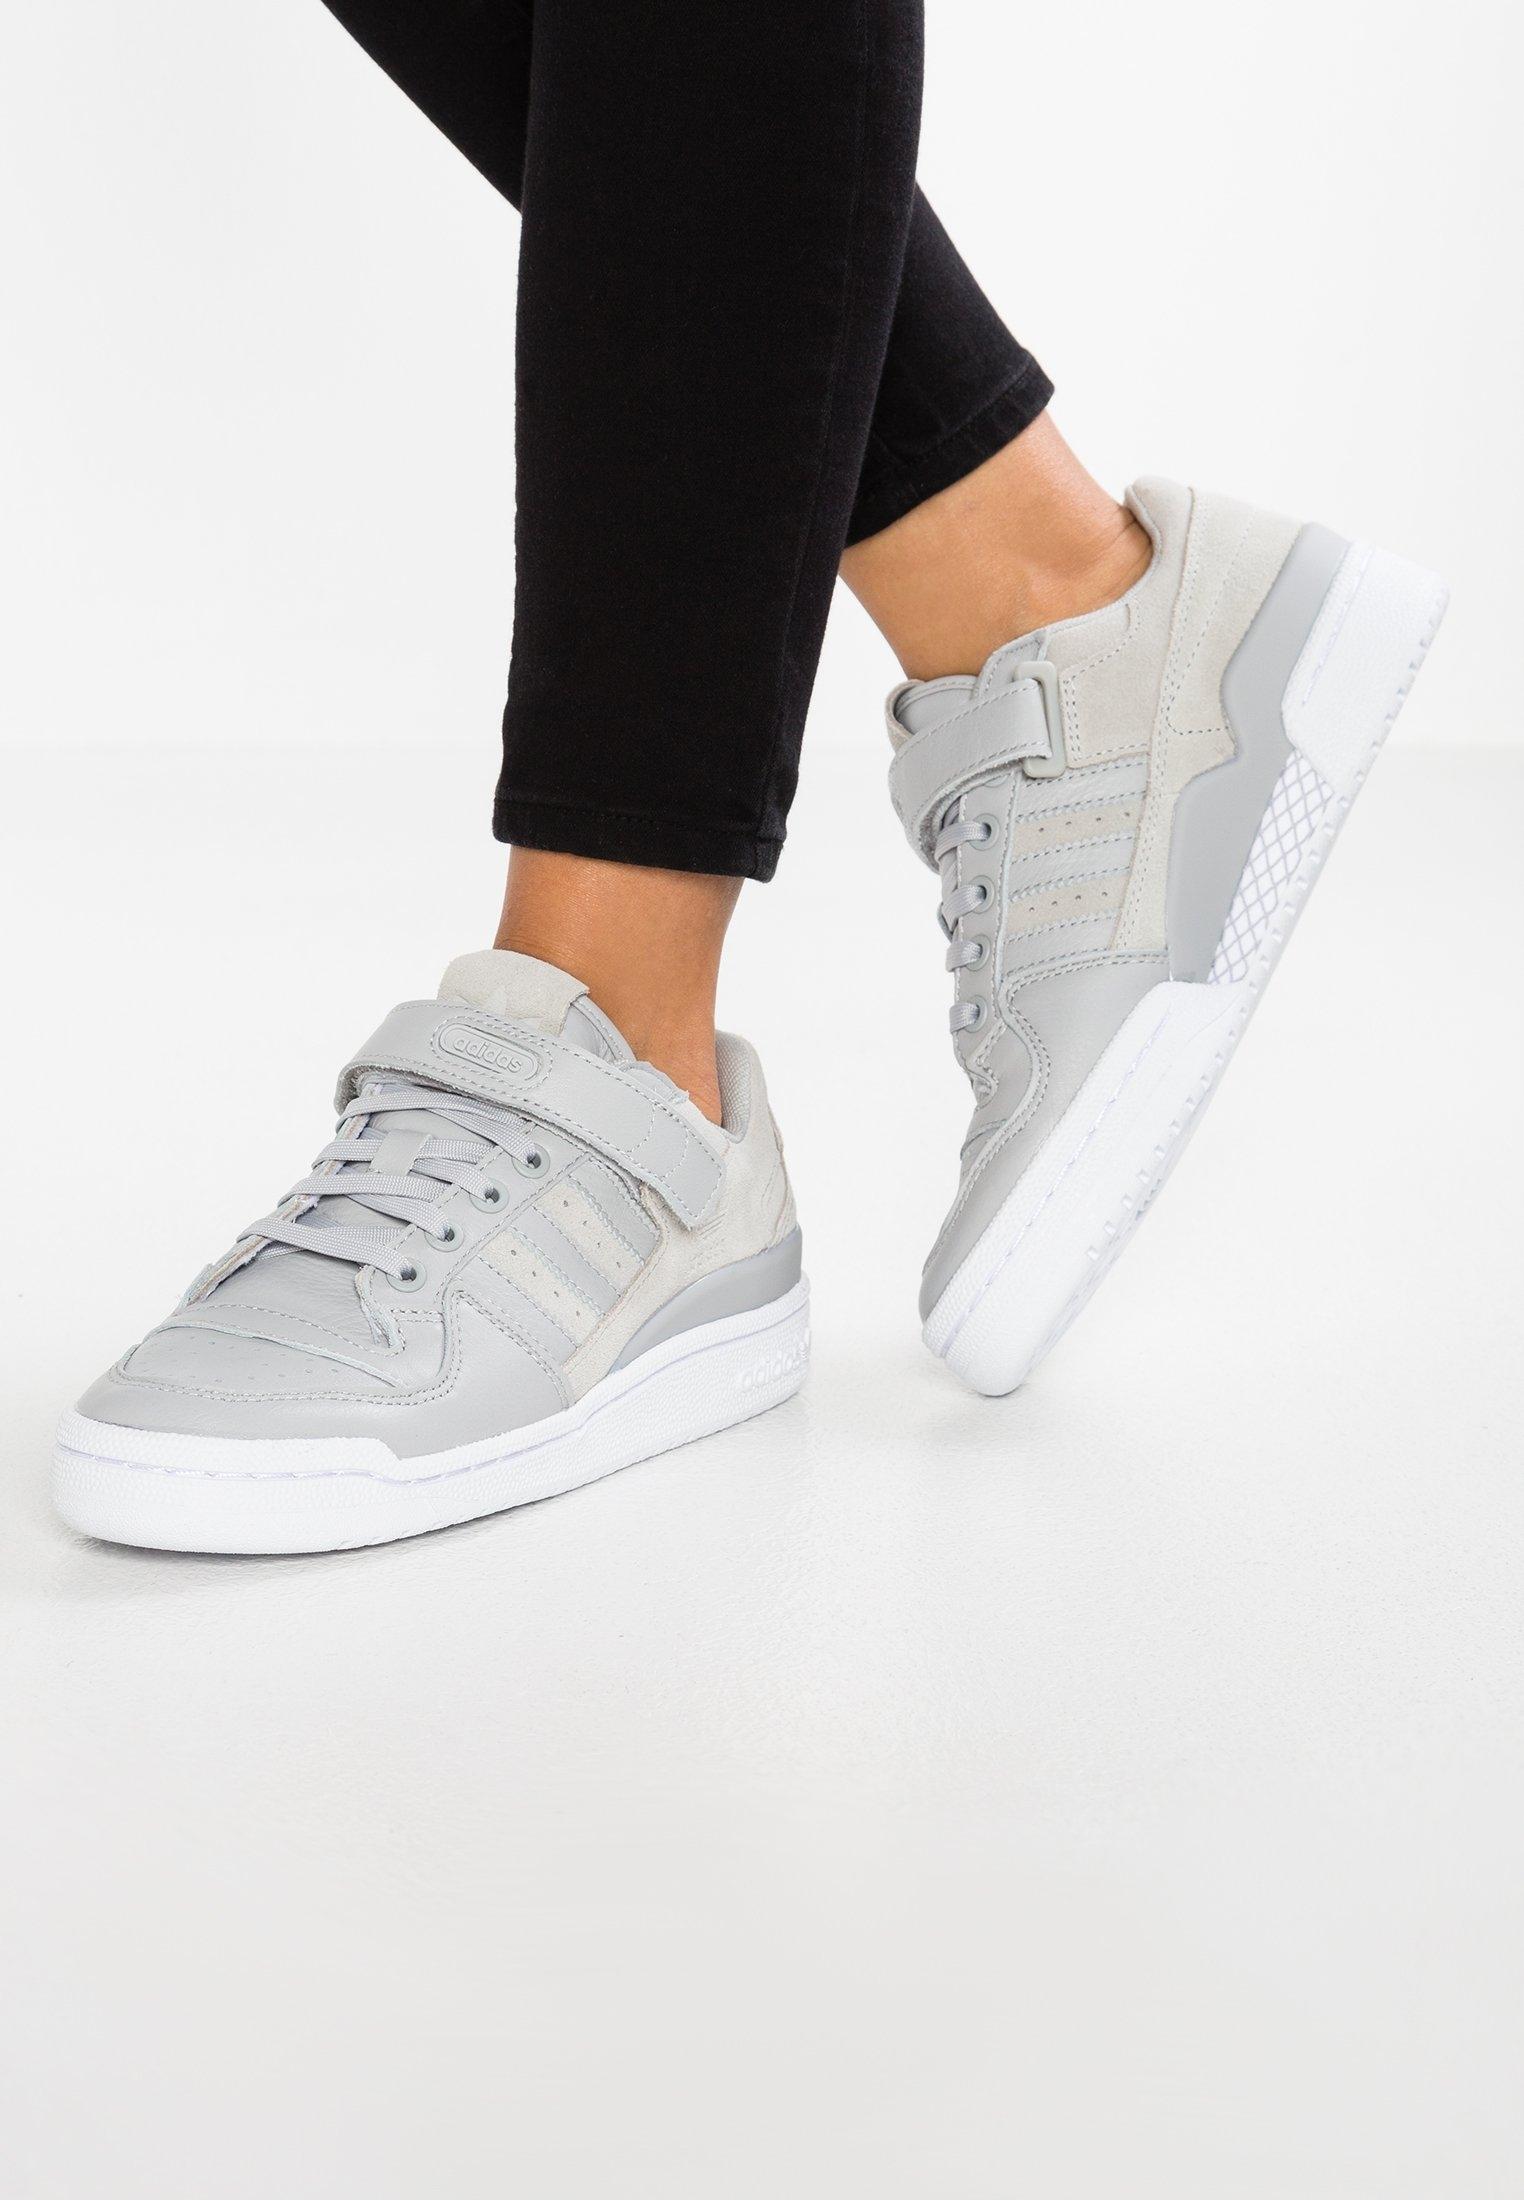 Sklep Buty Adidas Damskie Beżowe | Adidas Originals Forum Niskie